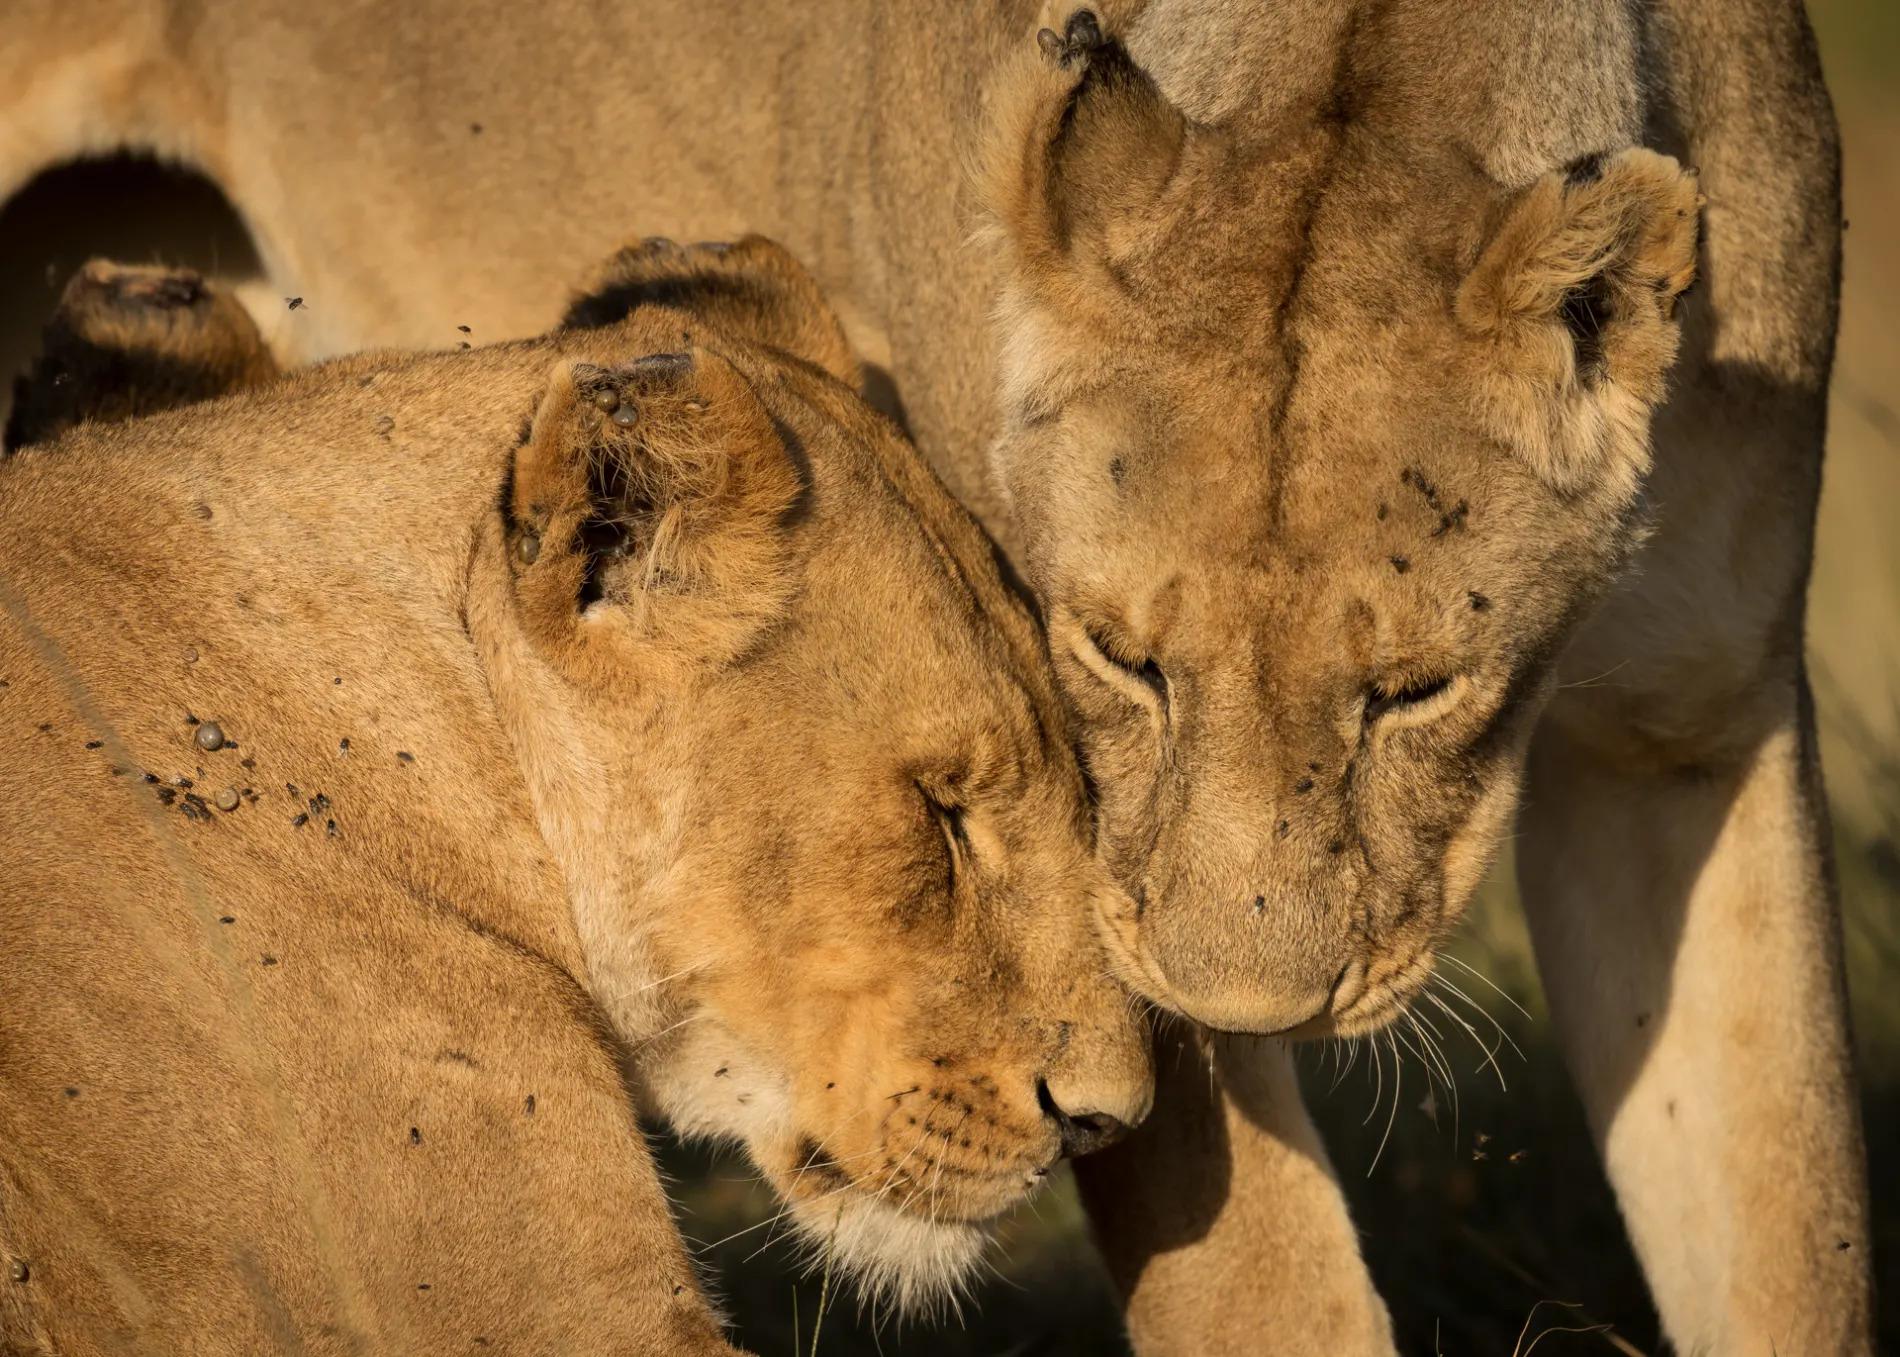 Lions greet